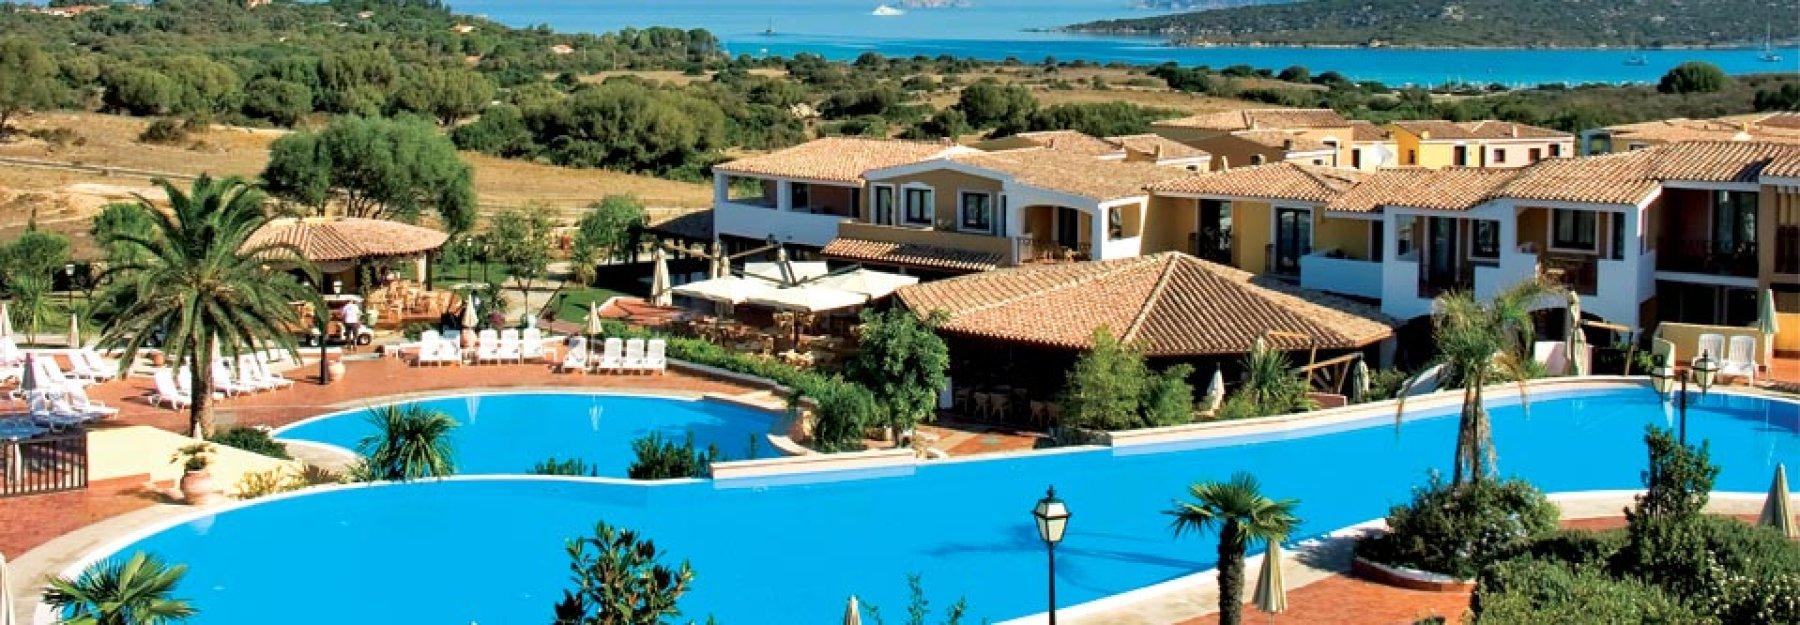 Villaggio santa clara palau family hotel sardegna hotel for Hotel palau sardegna